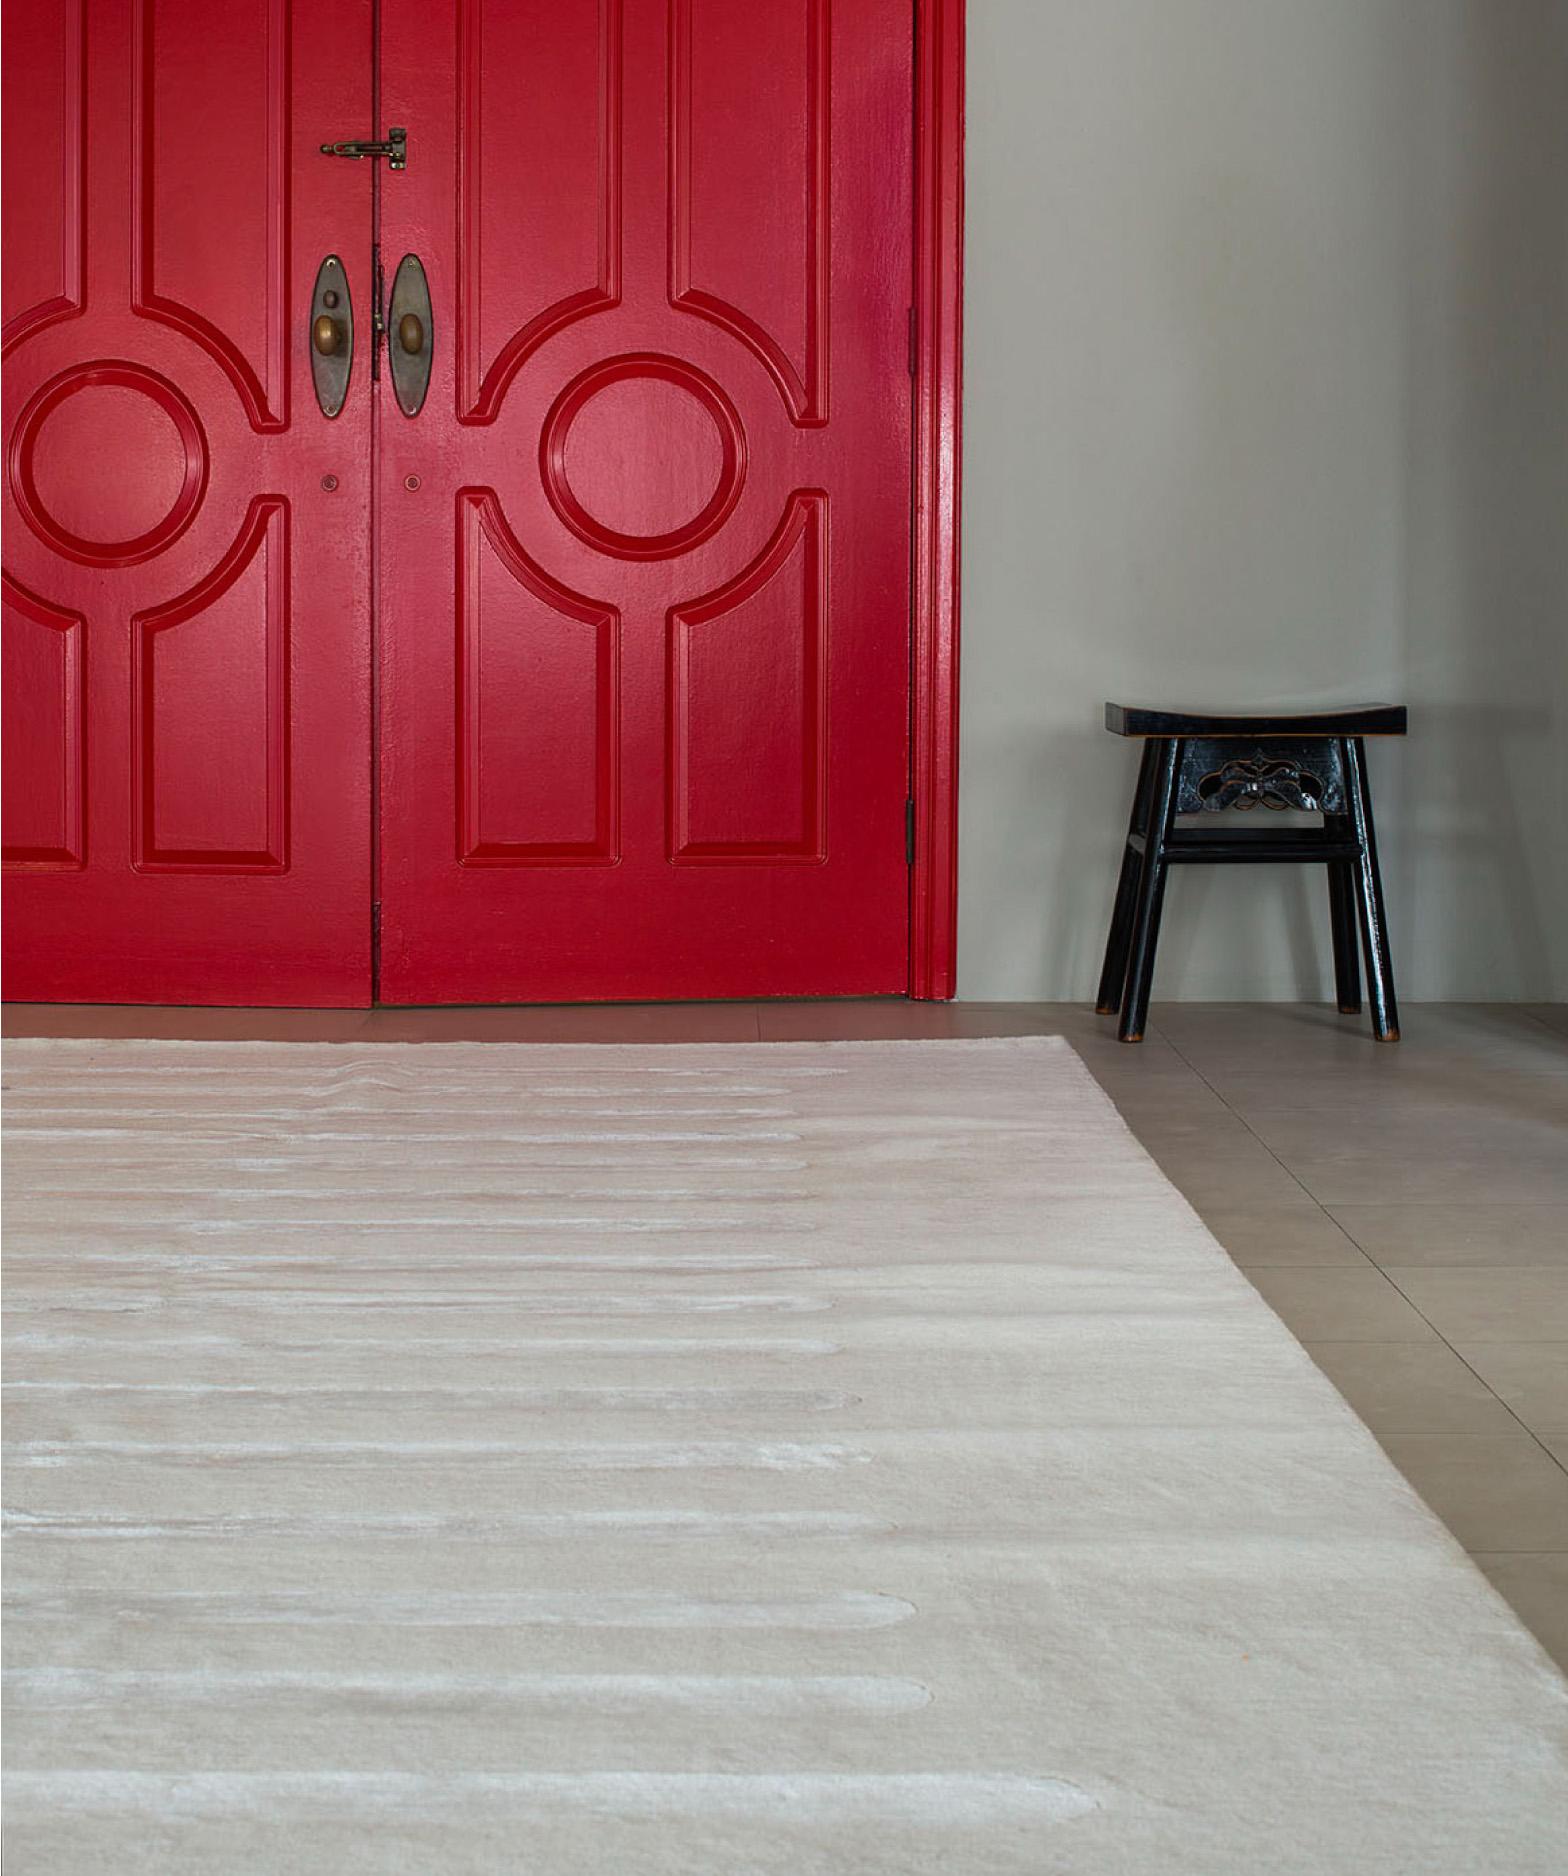 Red Carpet hallway Zebra